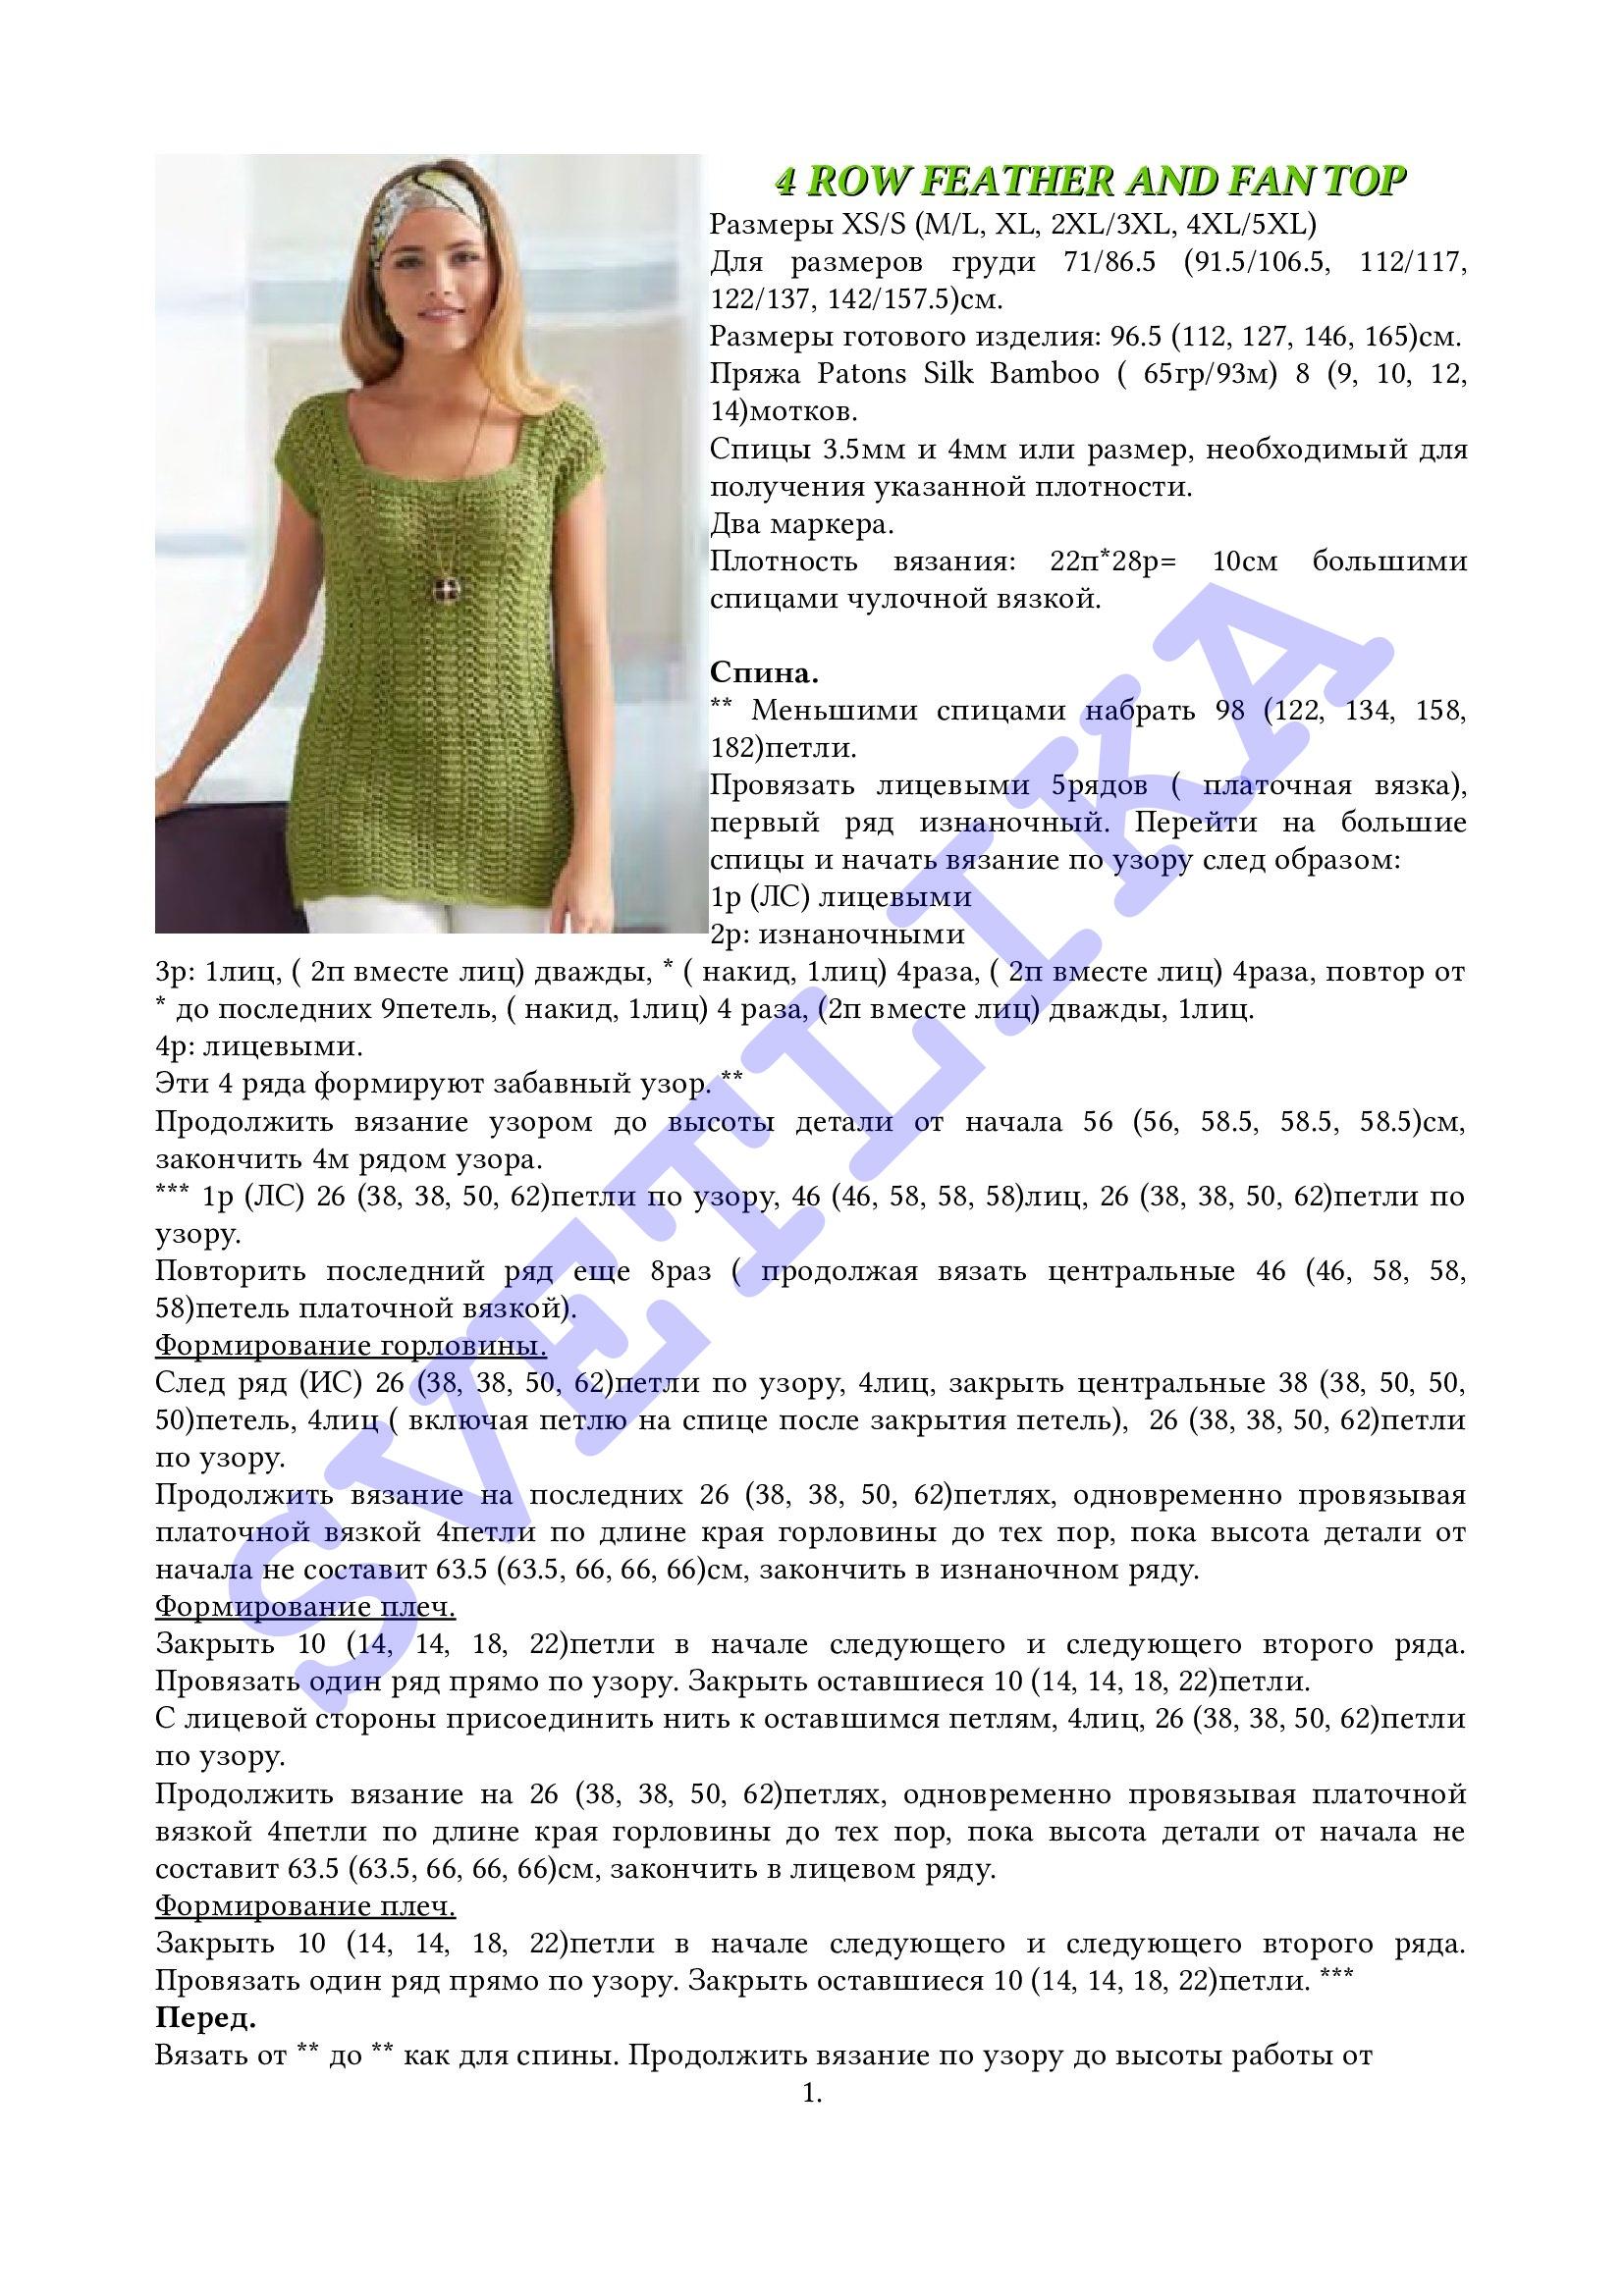 https://img-fotki.yandex.ru/get/3612/125862467.5f/0_16d68a_b88ead9d_orig